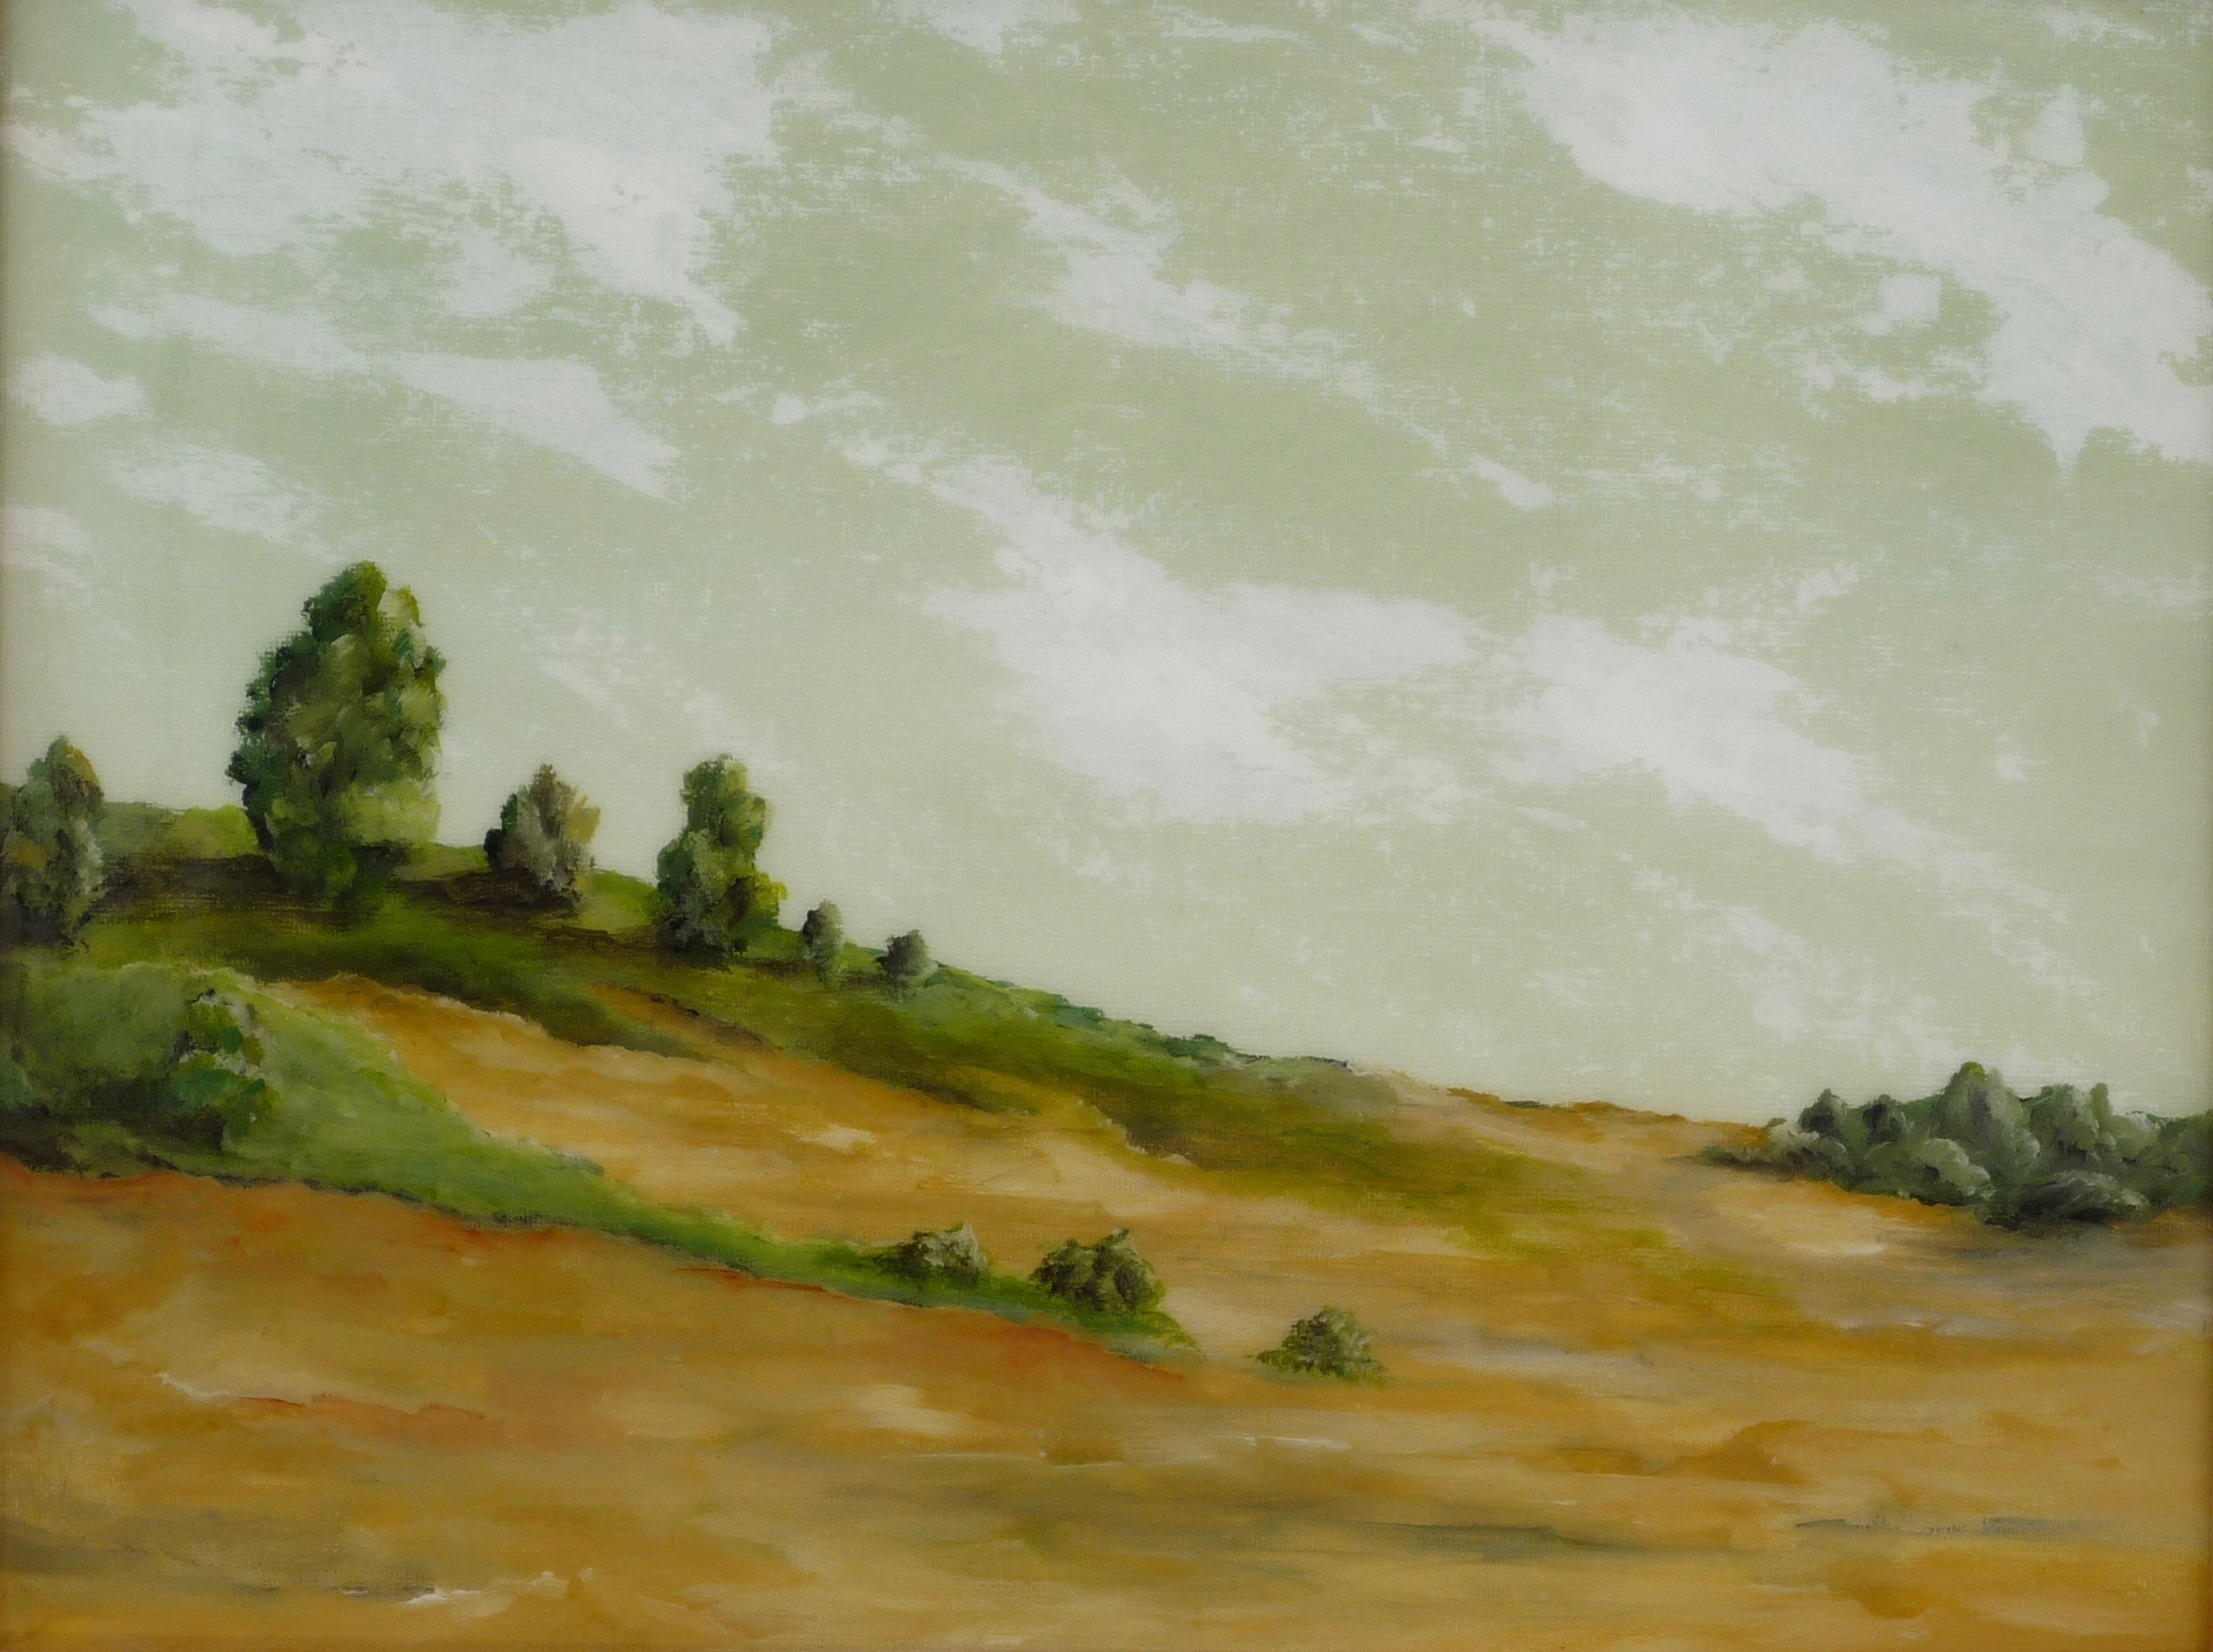 UnTitled: Landscape III